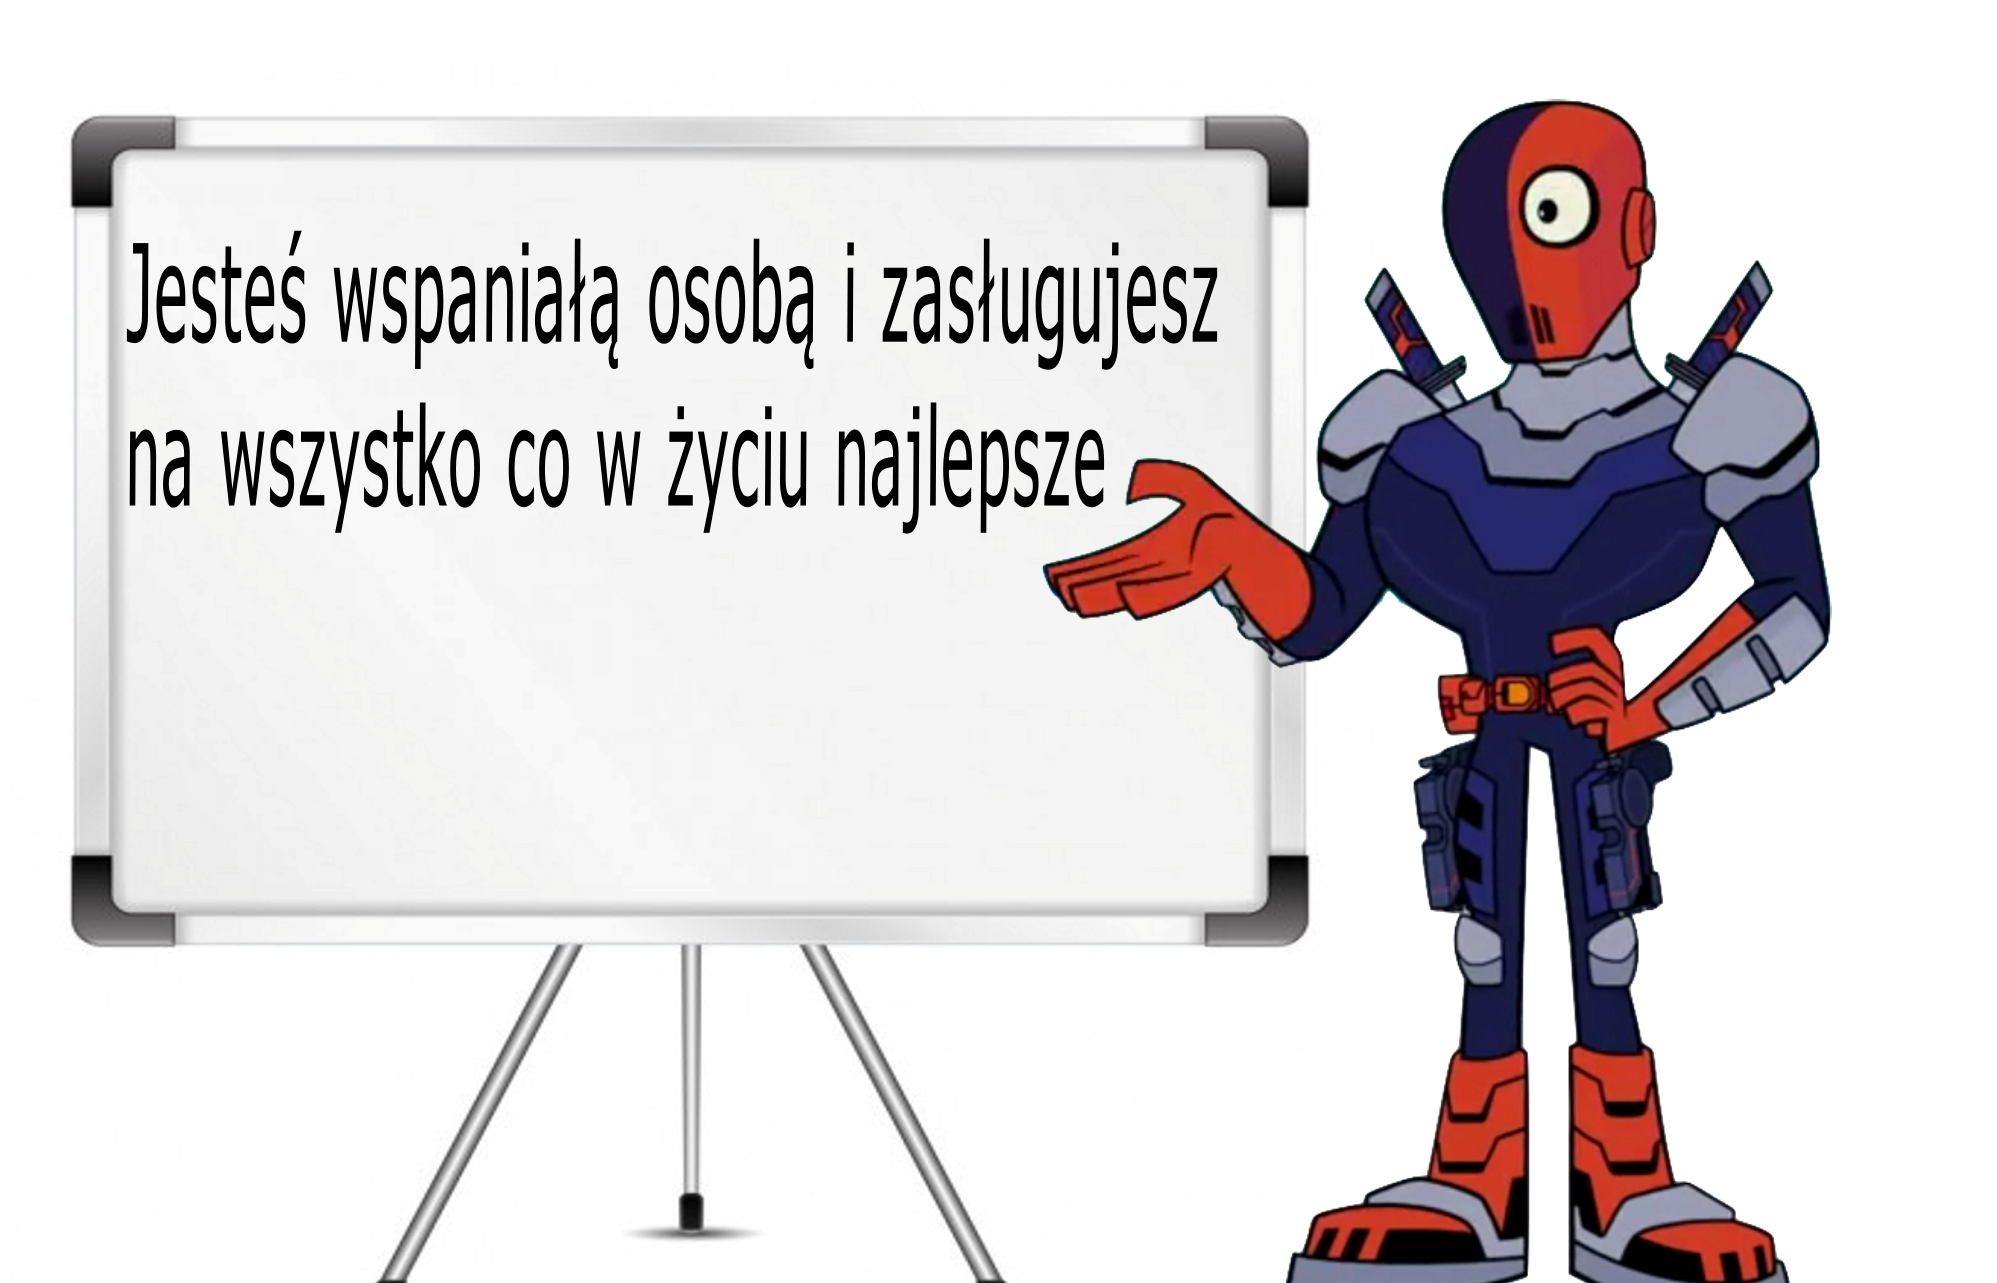 titansgo.pl/upload/img/5e907830019e6.png